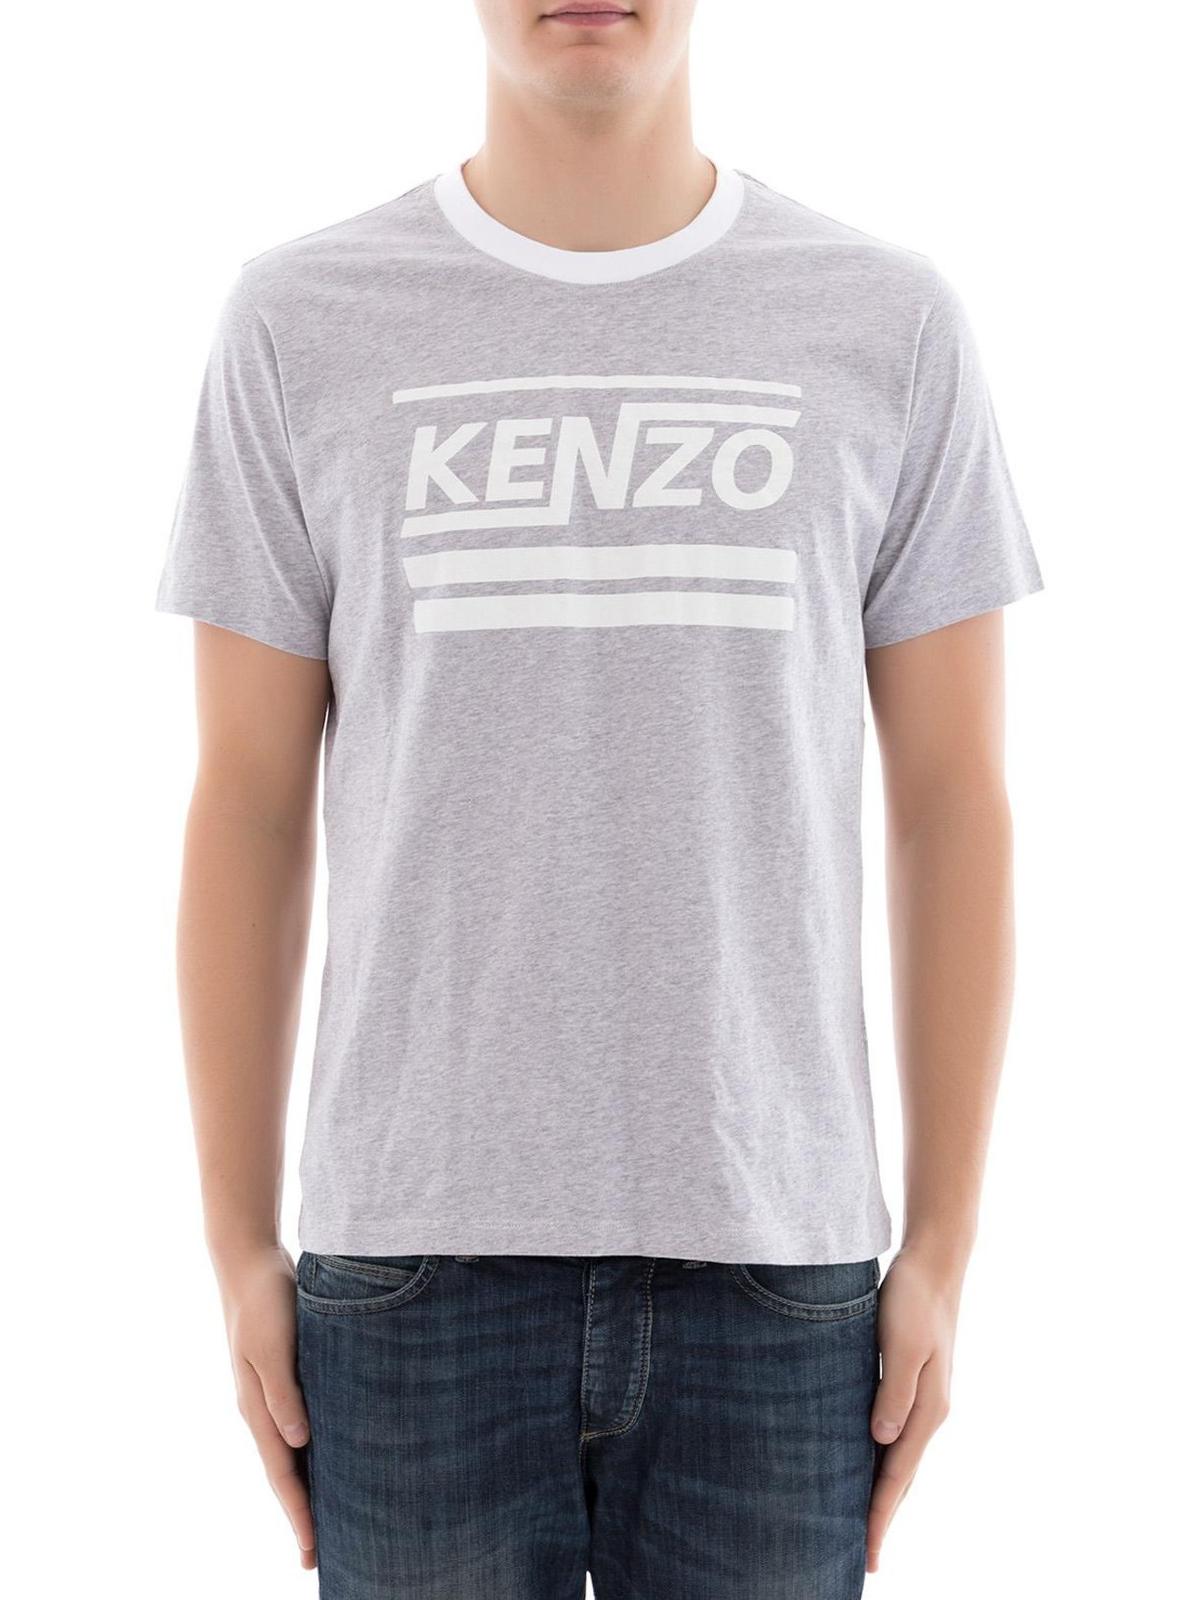 c800e5e5 Kenzo - Hyper Kenzo print cotton T-shirt - t-shirts - F855TS0184SA94L